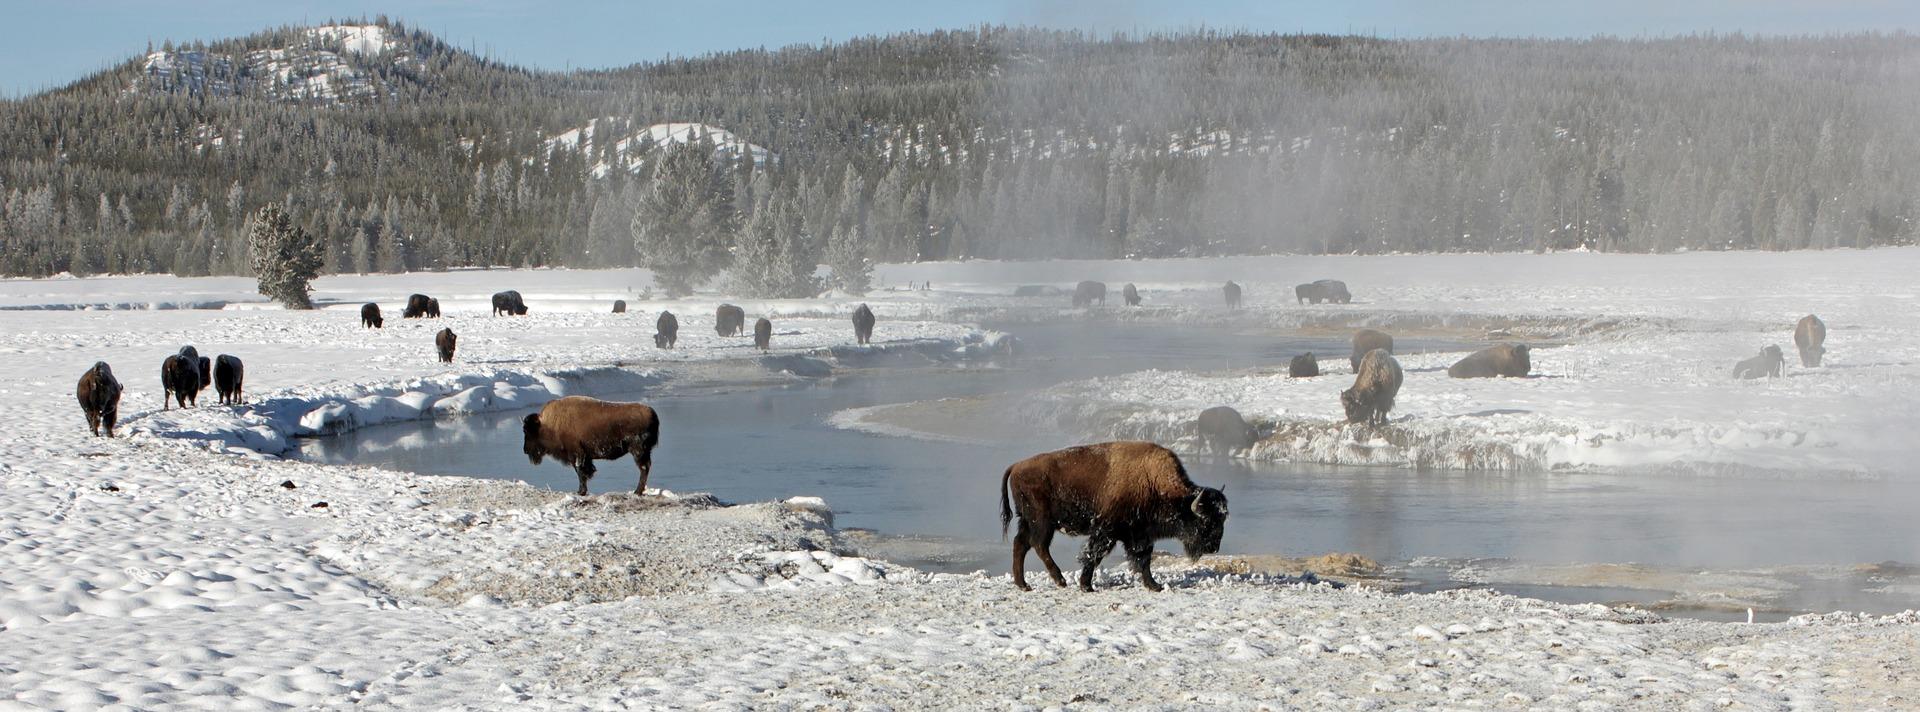 bison-buffalo.jpg